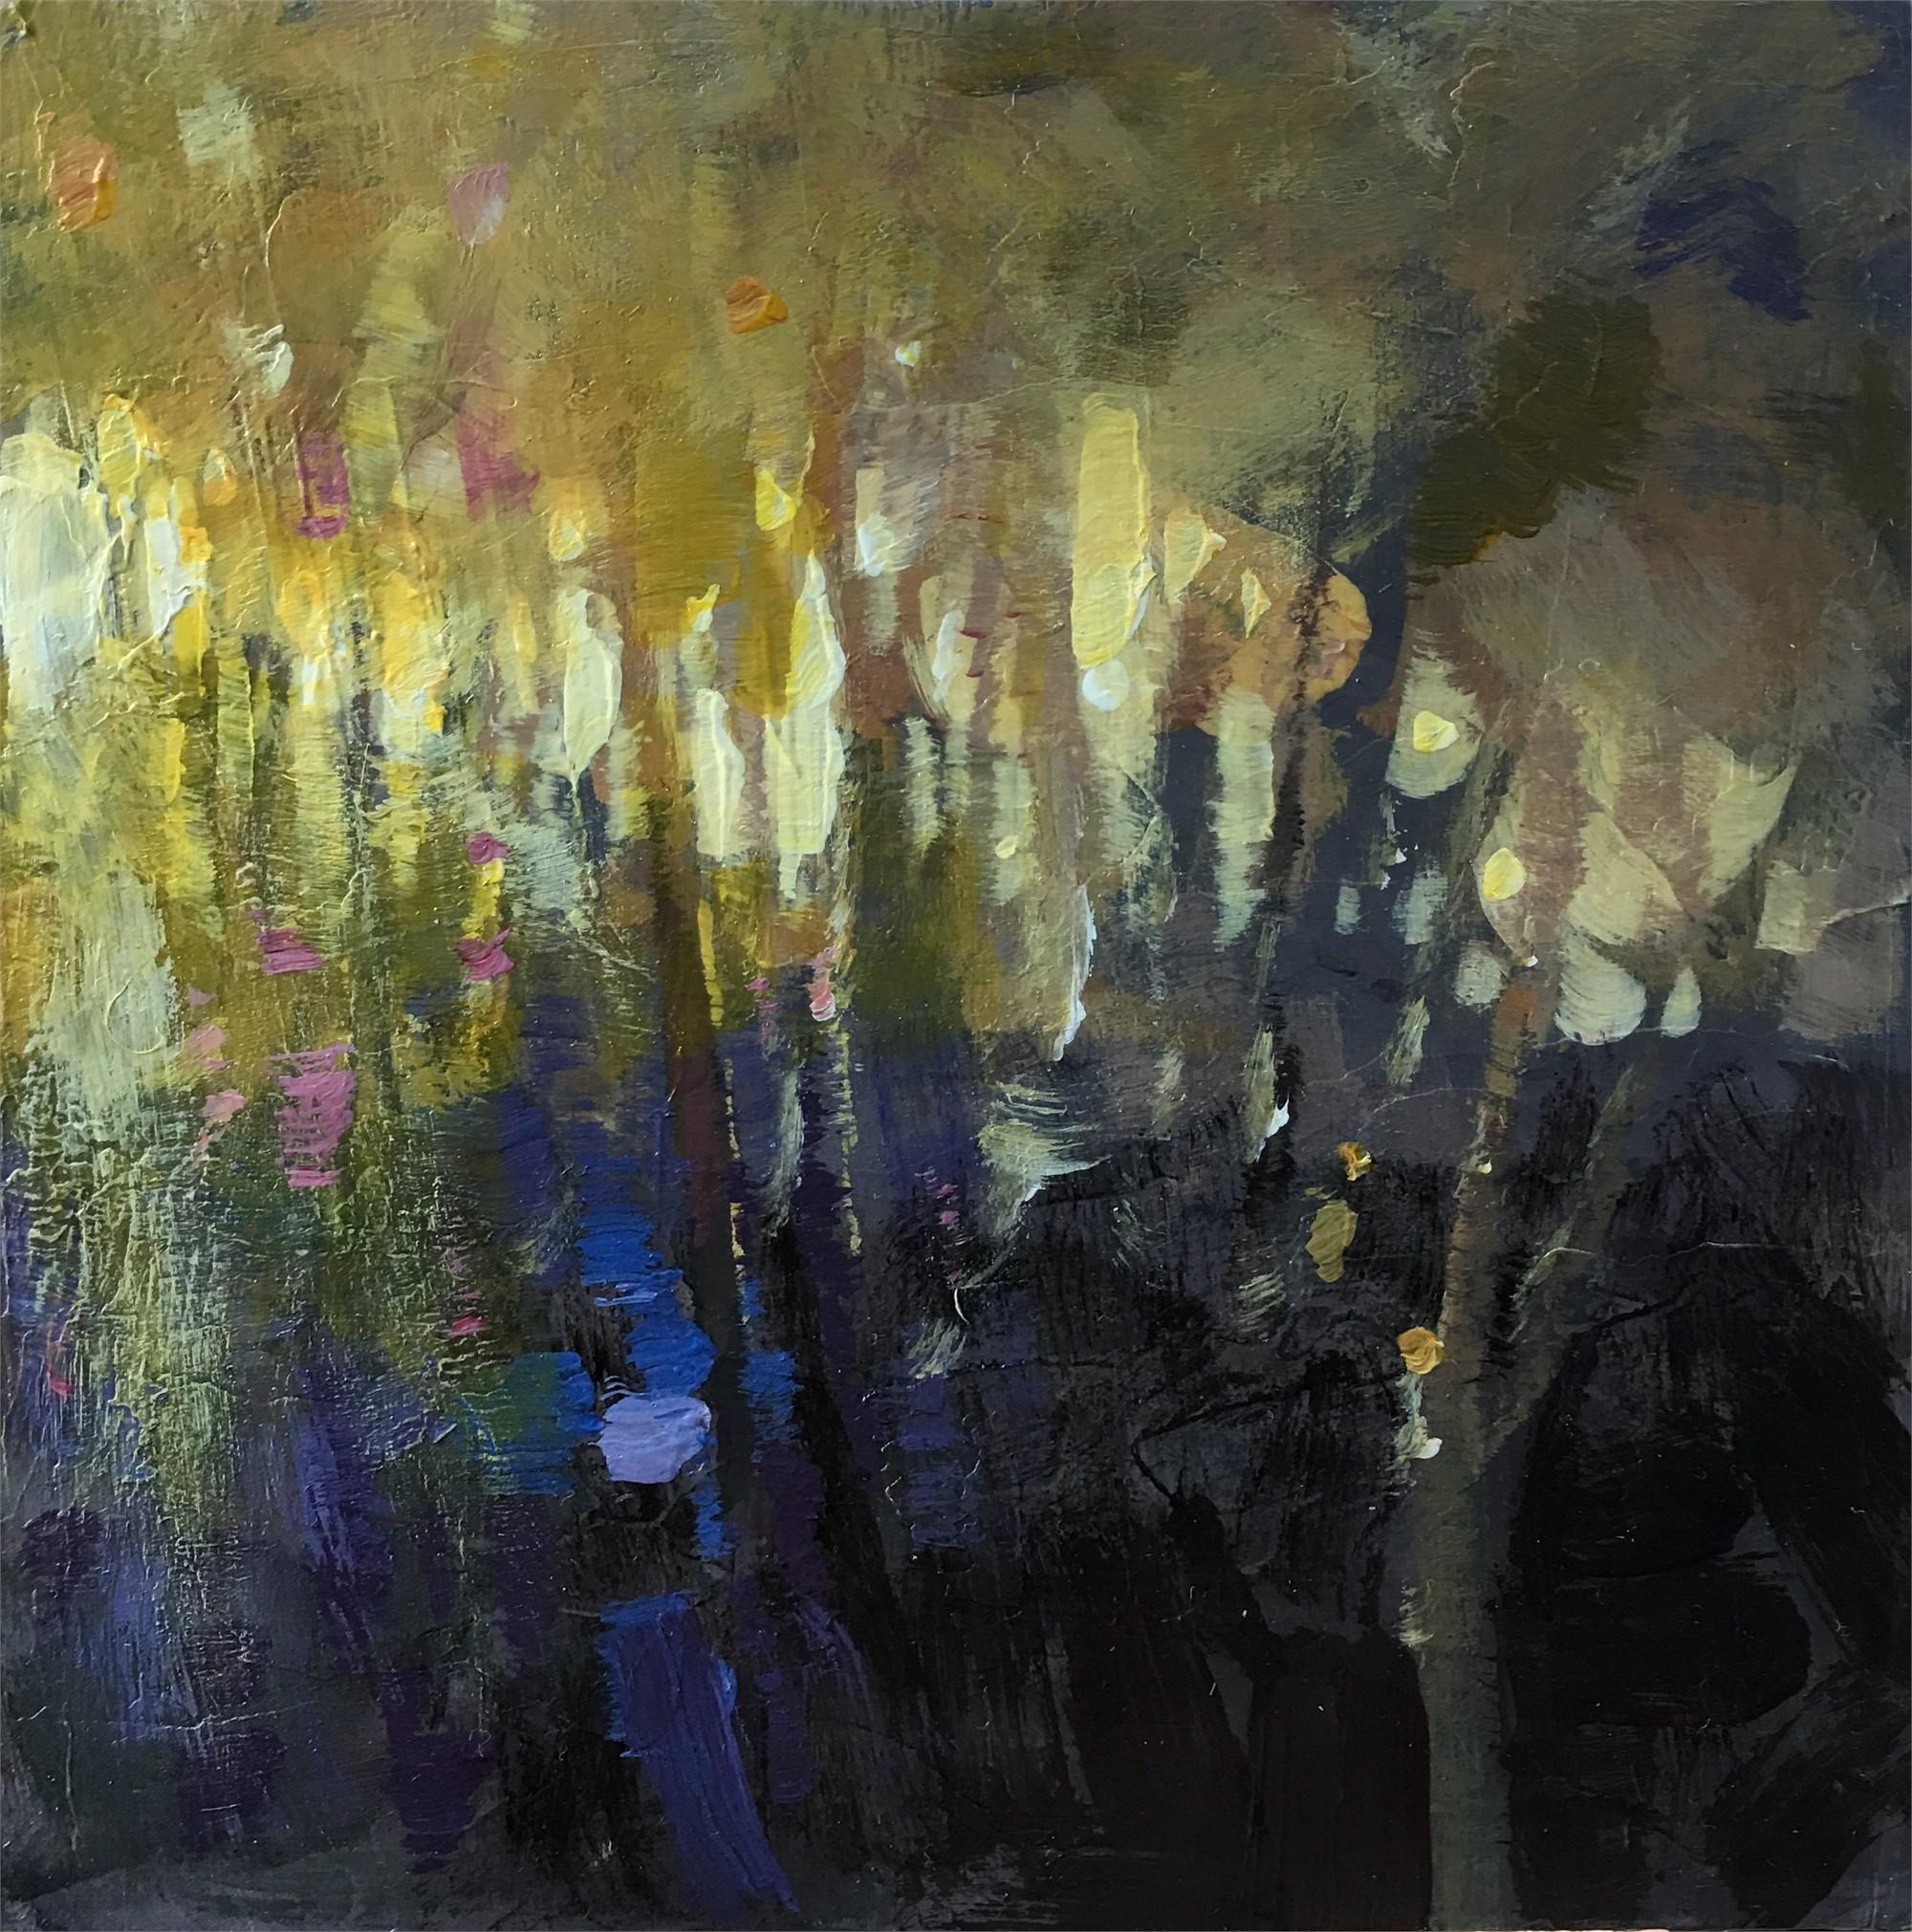 Forest Jewels by Jason Sacran